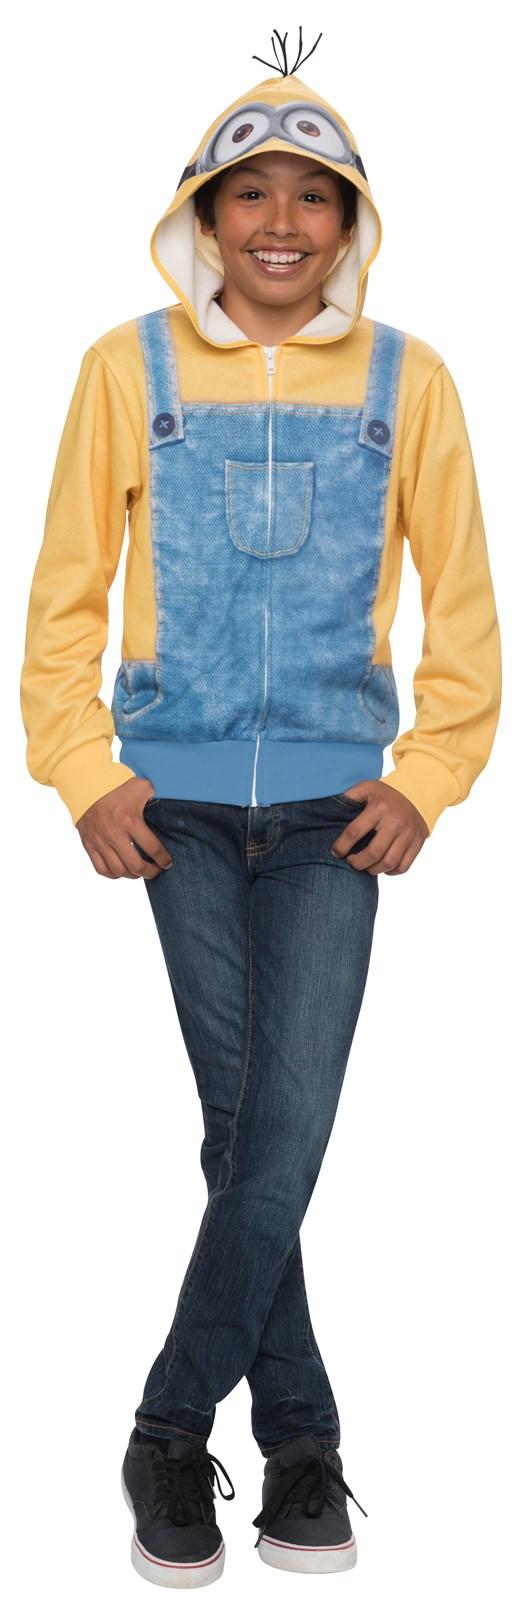 Minions Movie: Minion Hoodie Sweatshirt For Kids